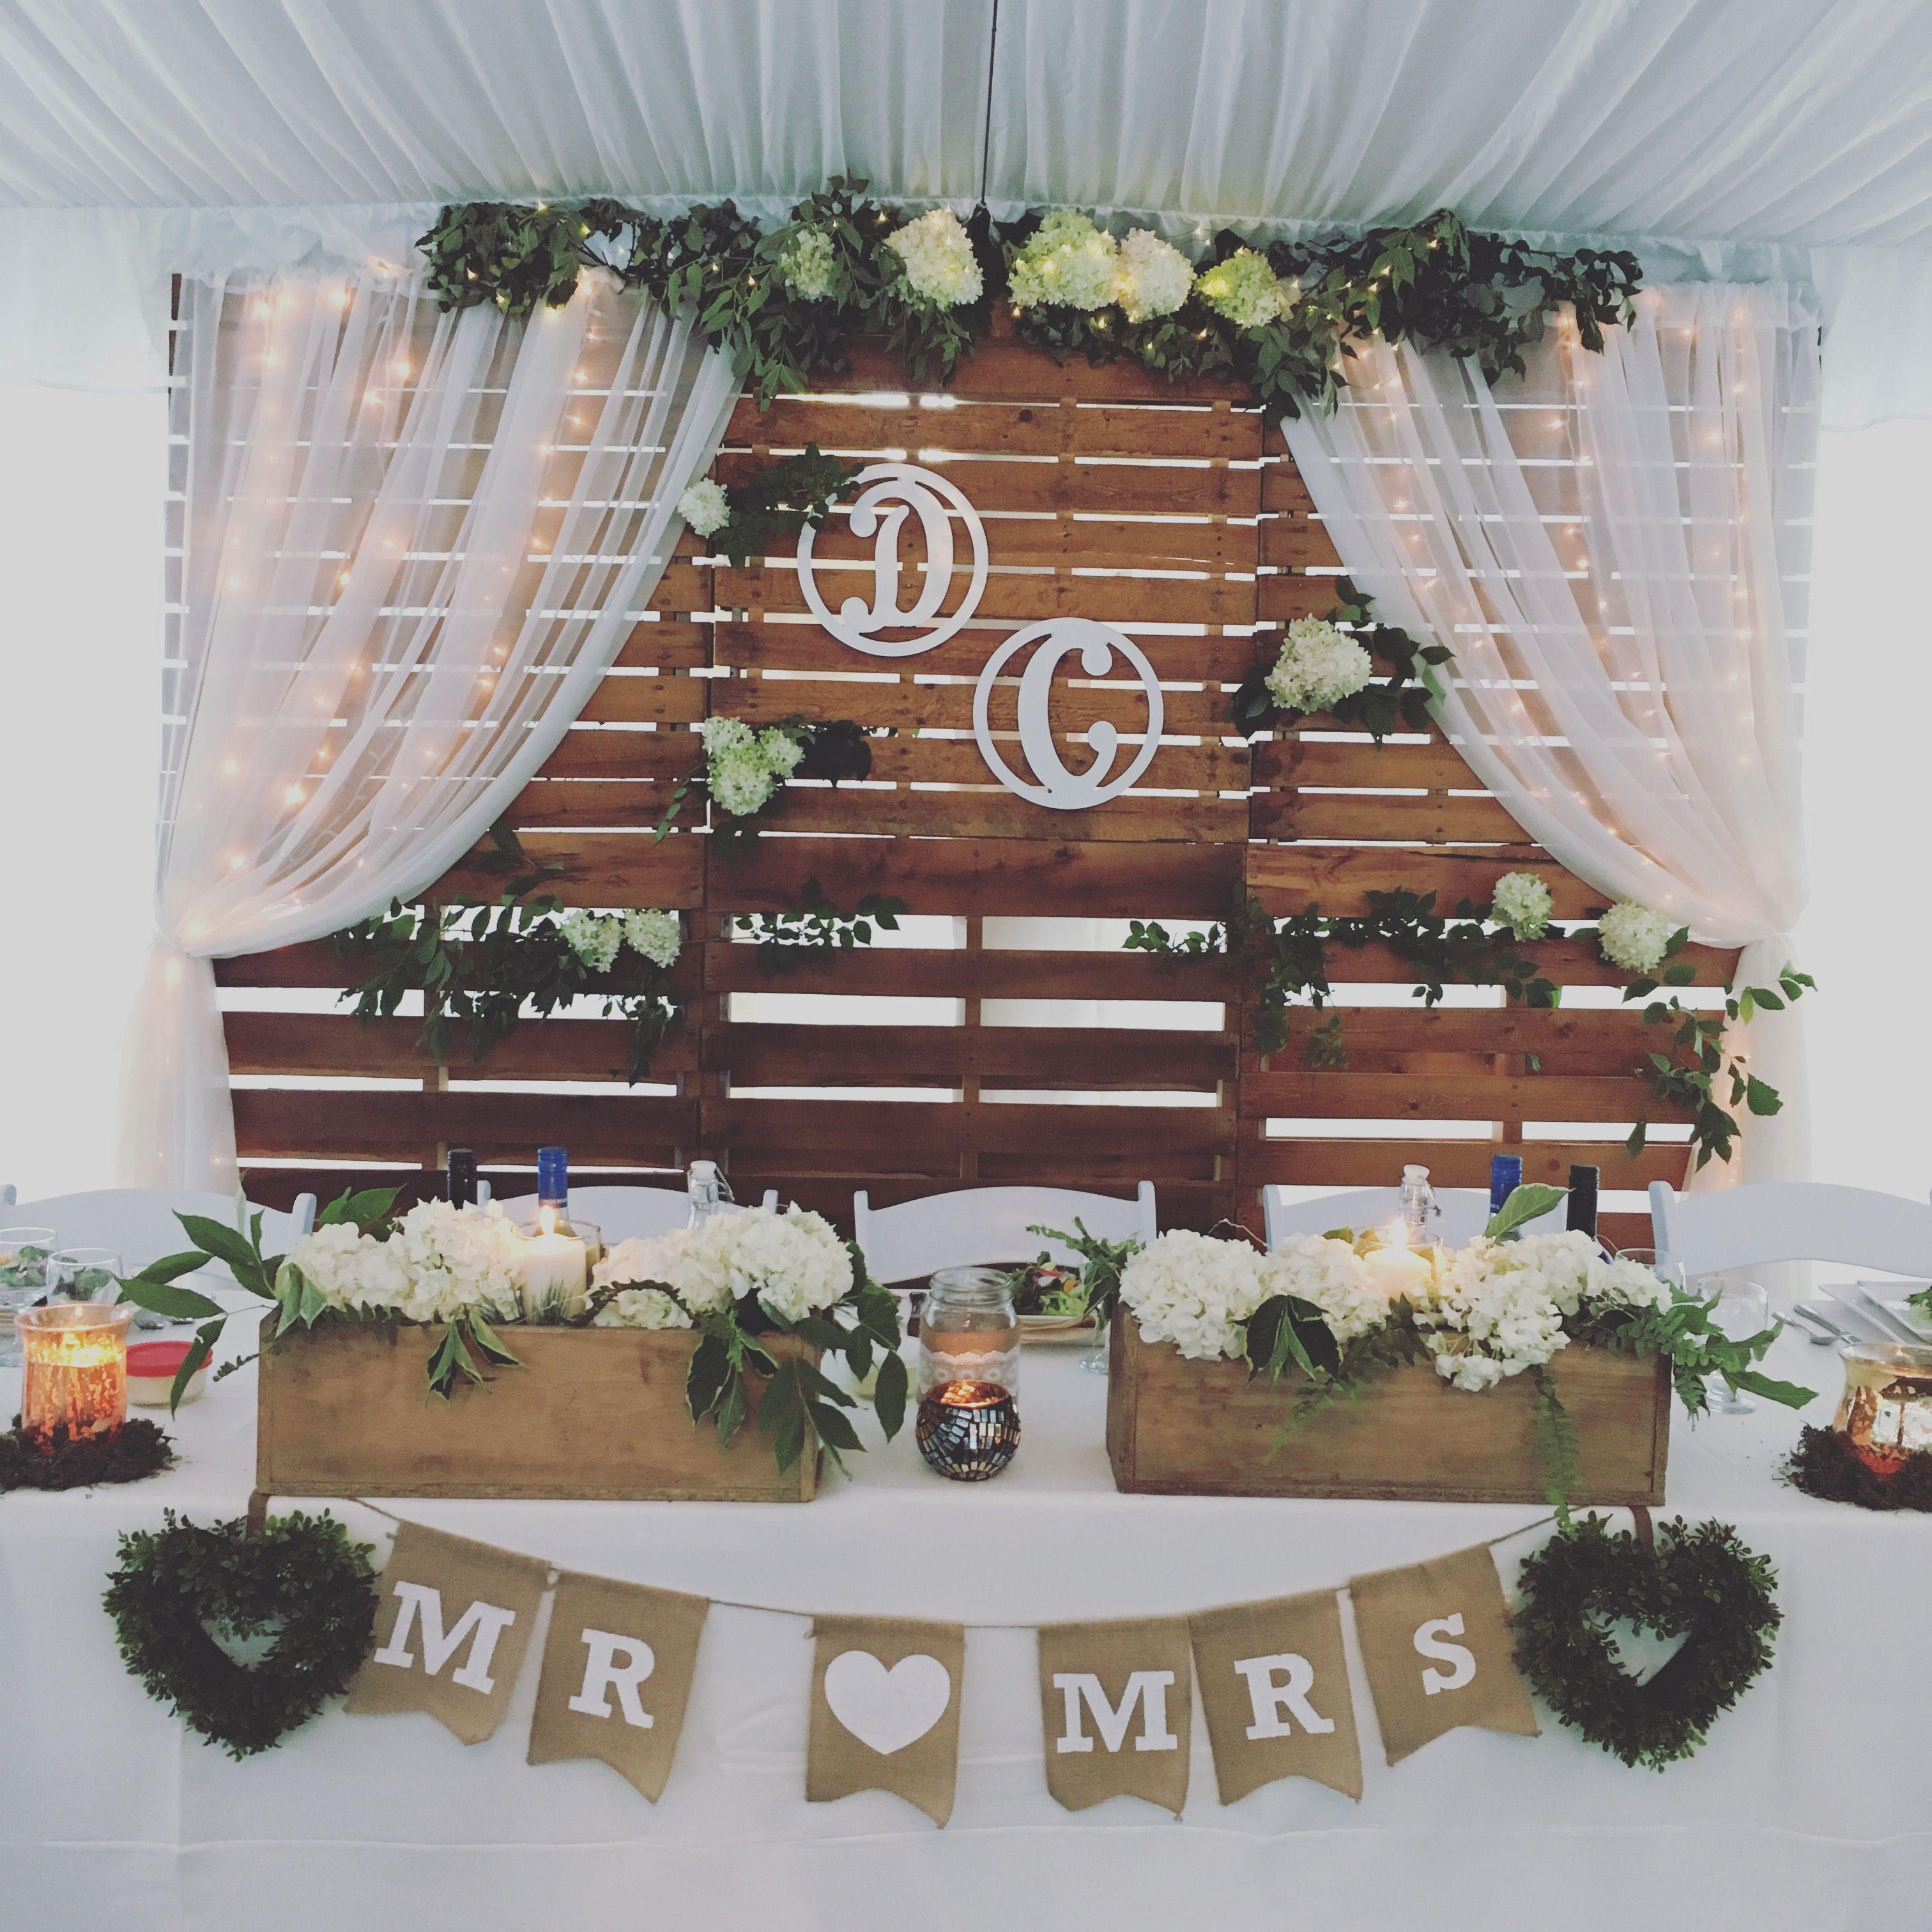 Vintage Wedding Head Table Ideas: Rustic Head Table And Backdrop. Wooden Backdrop Wedding